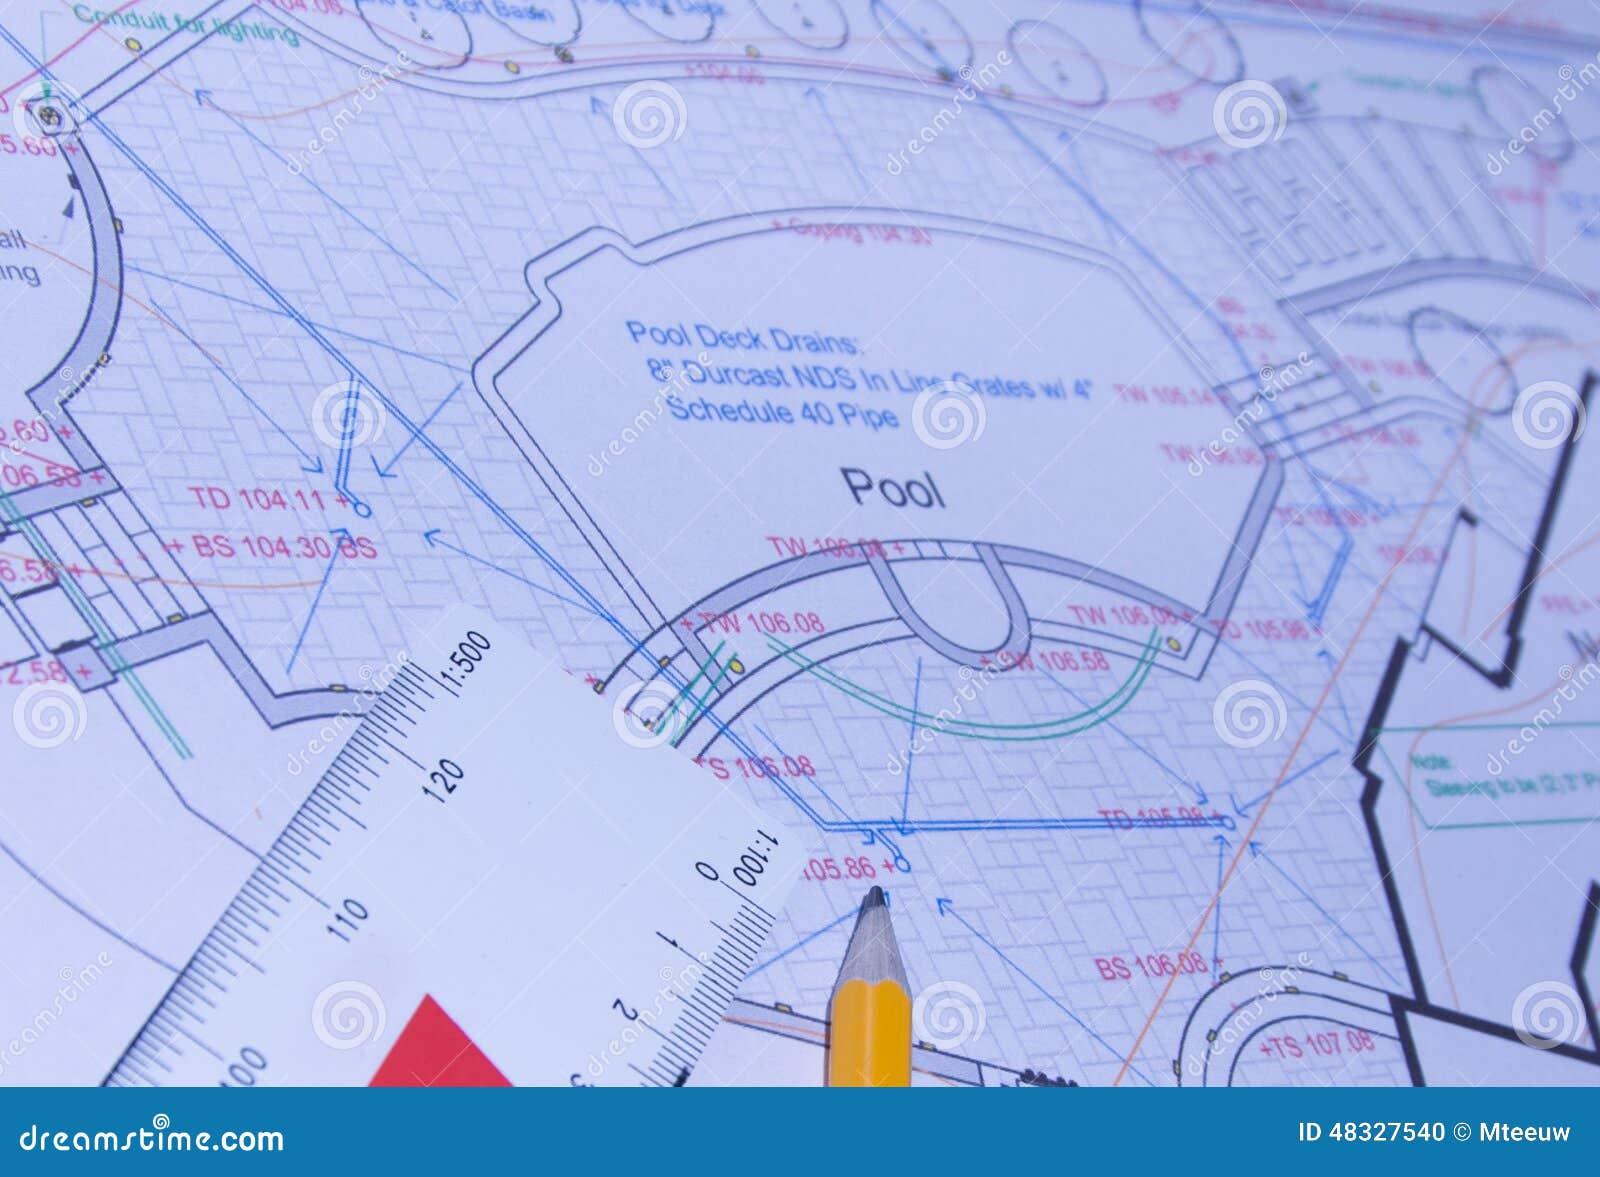 Engineering Plans Stock Illustration Illustration Of Concept 48327540